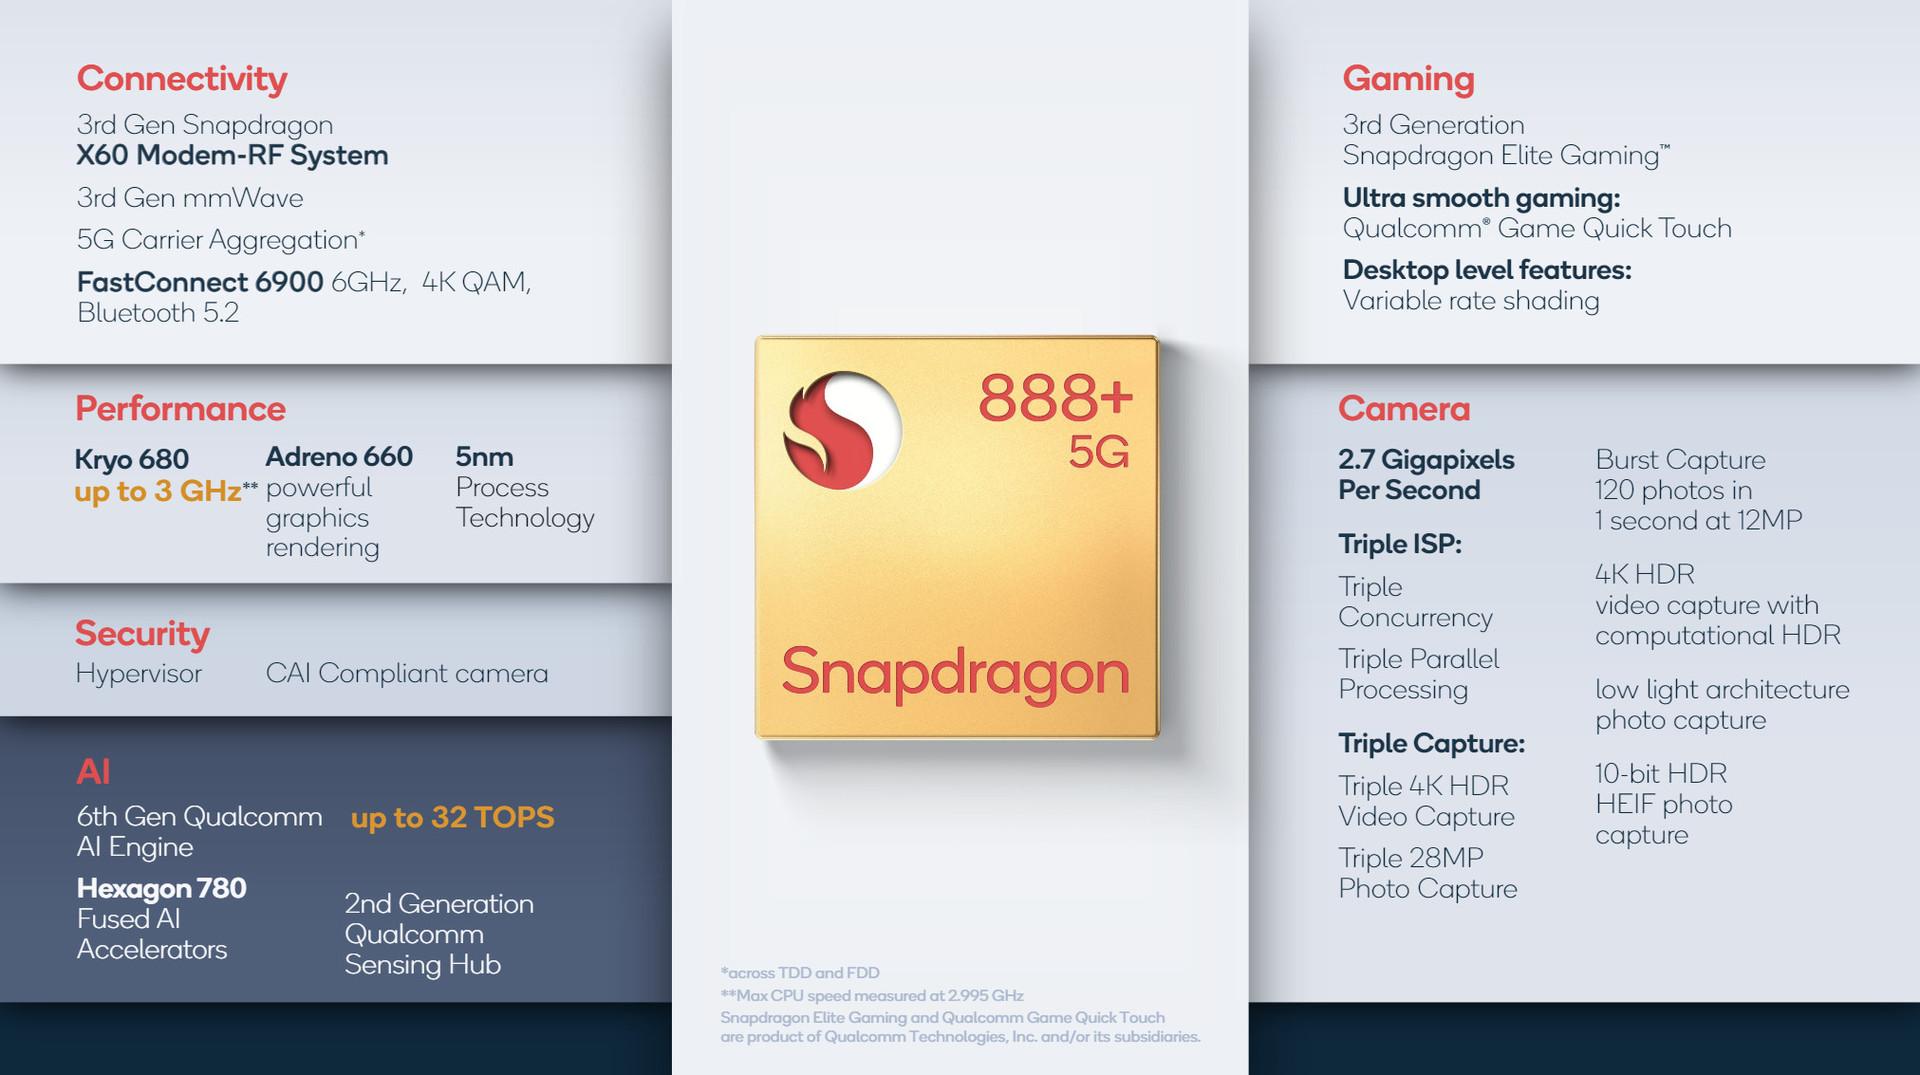 Qualcomm Snapdragon 888 Plus launched